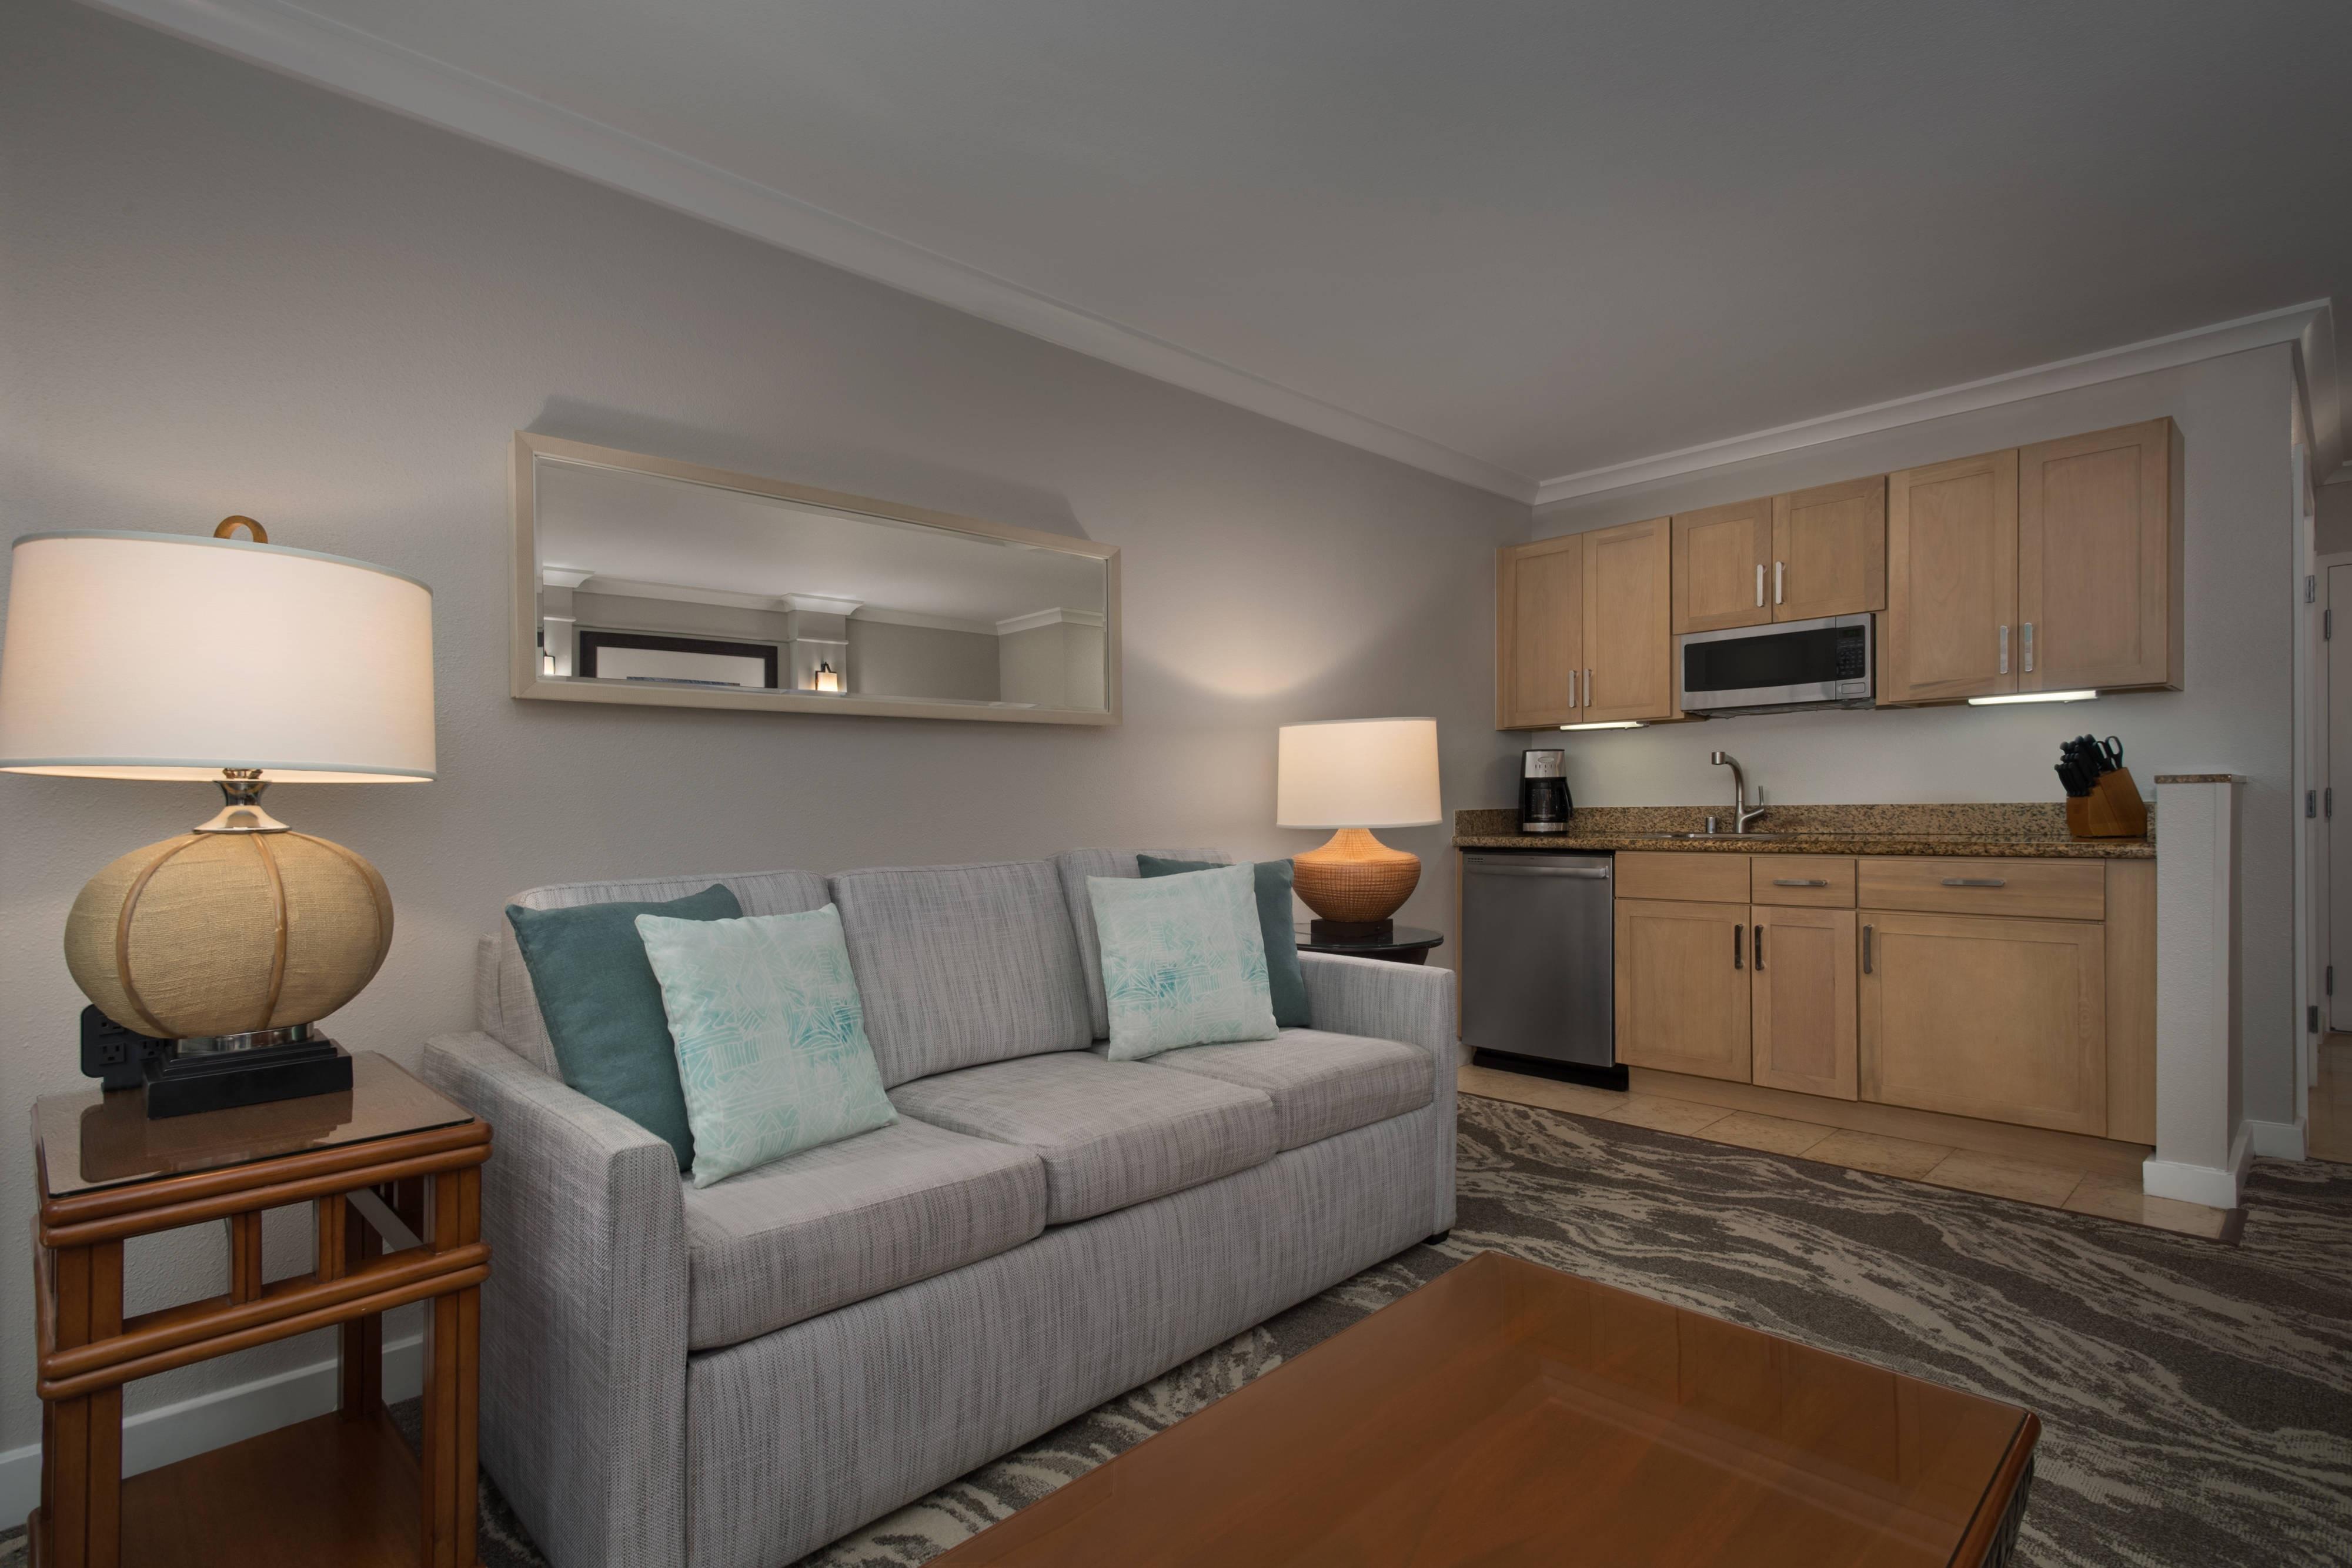 Maui 2 Bedroom Suite Marriott 39 S Maui Ocean Club Molokai Maui Lanai Towers